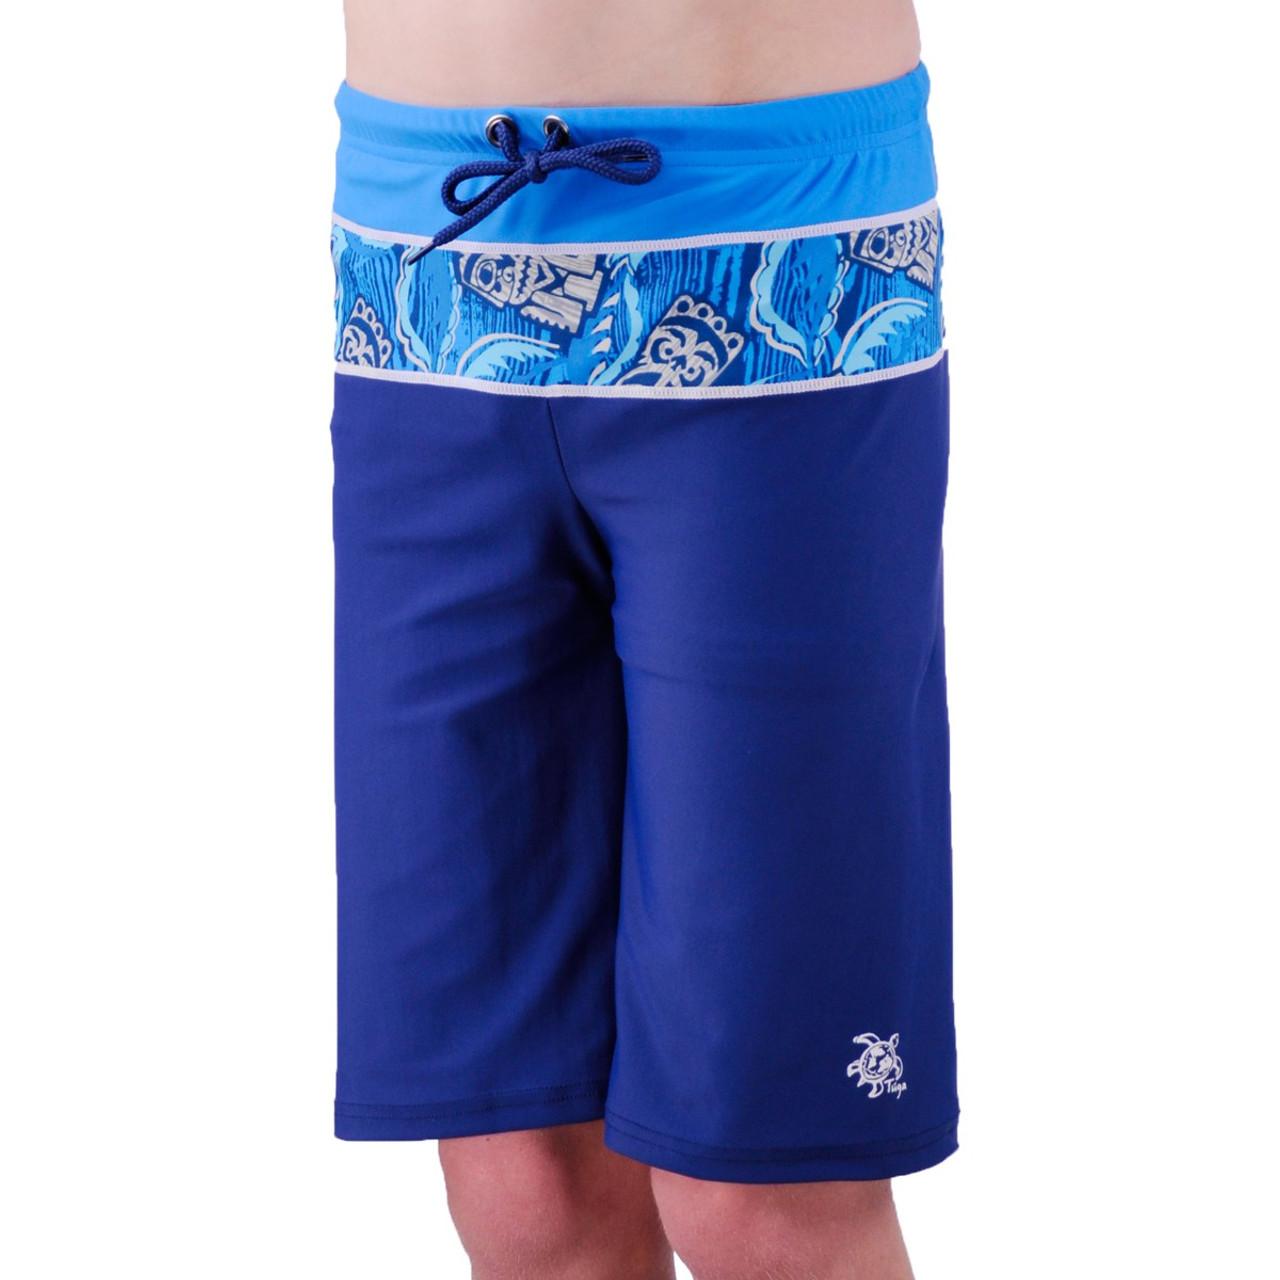 c2242d71e7438 Boys Tuga 'South Swell' Board Shorts UPF50 | Boys UV Clothing